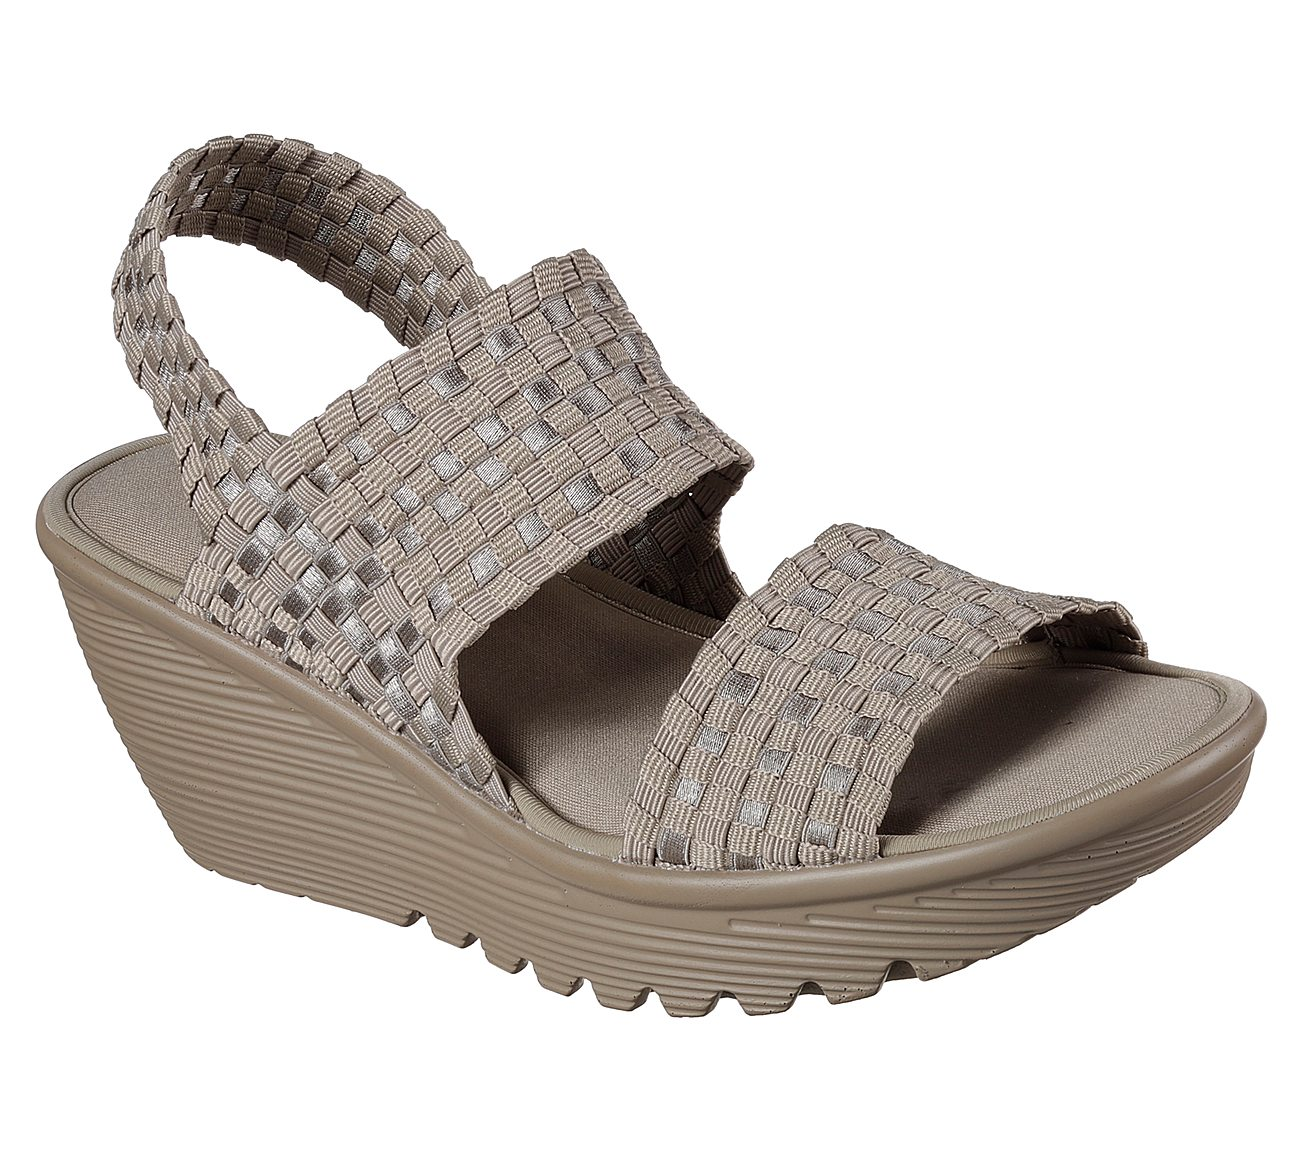 Lanzamiento Dalset tímido  Buy SKECHERS Parallel - Tumbleweave SKECHERS Cali Shoes